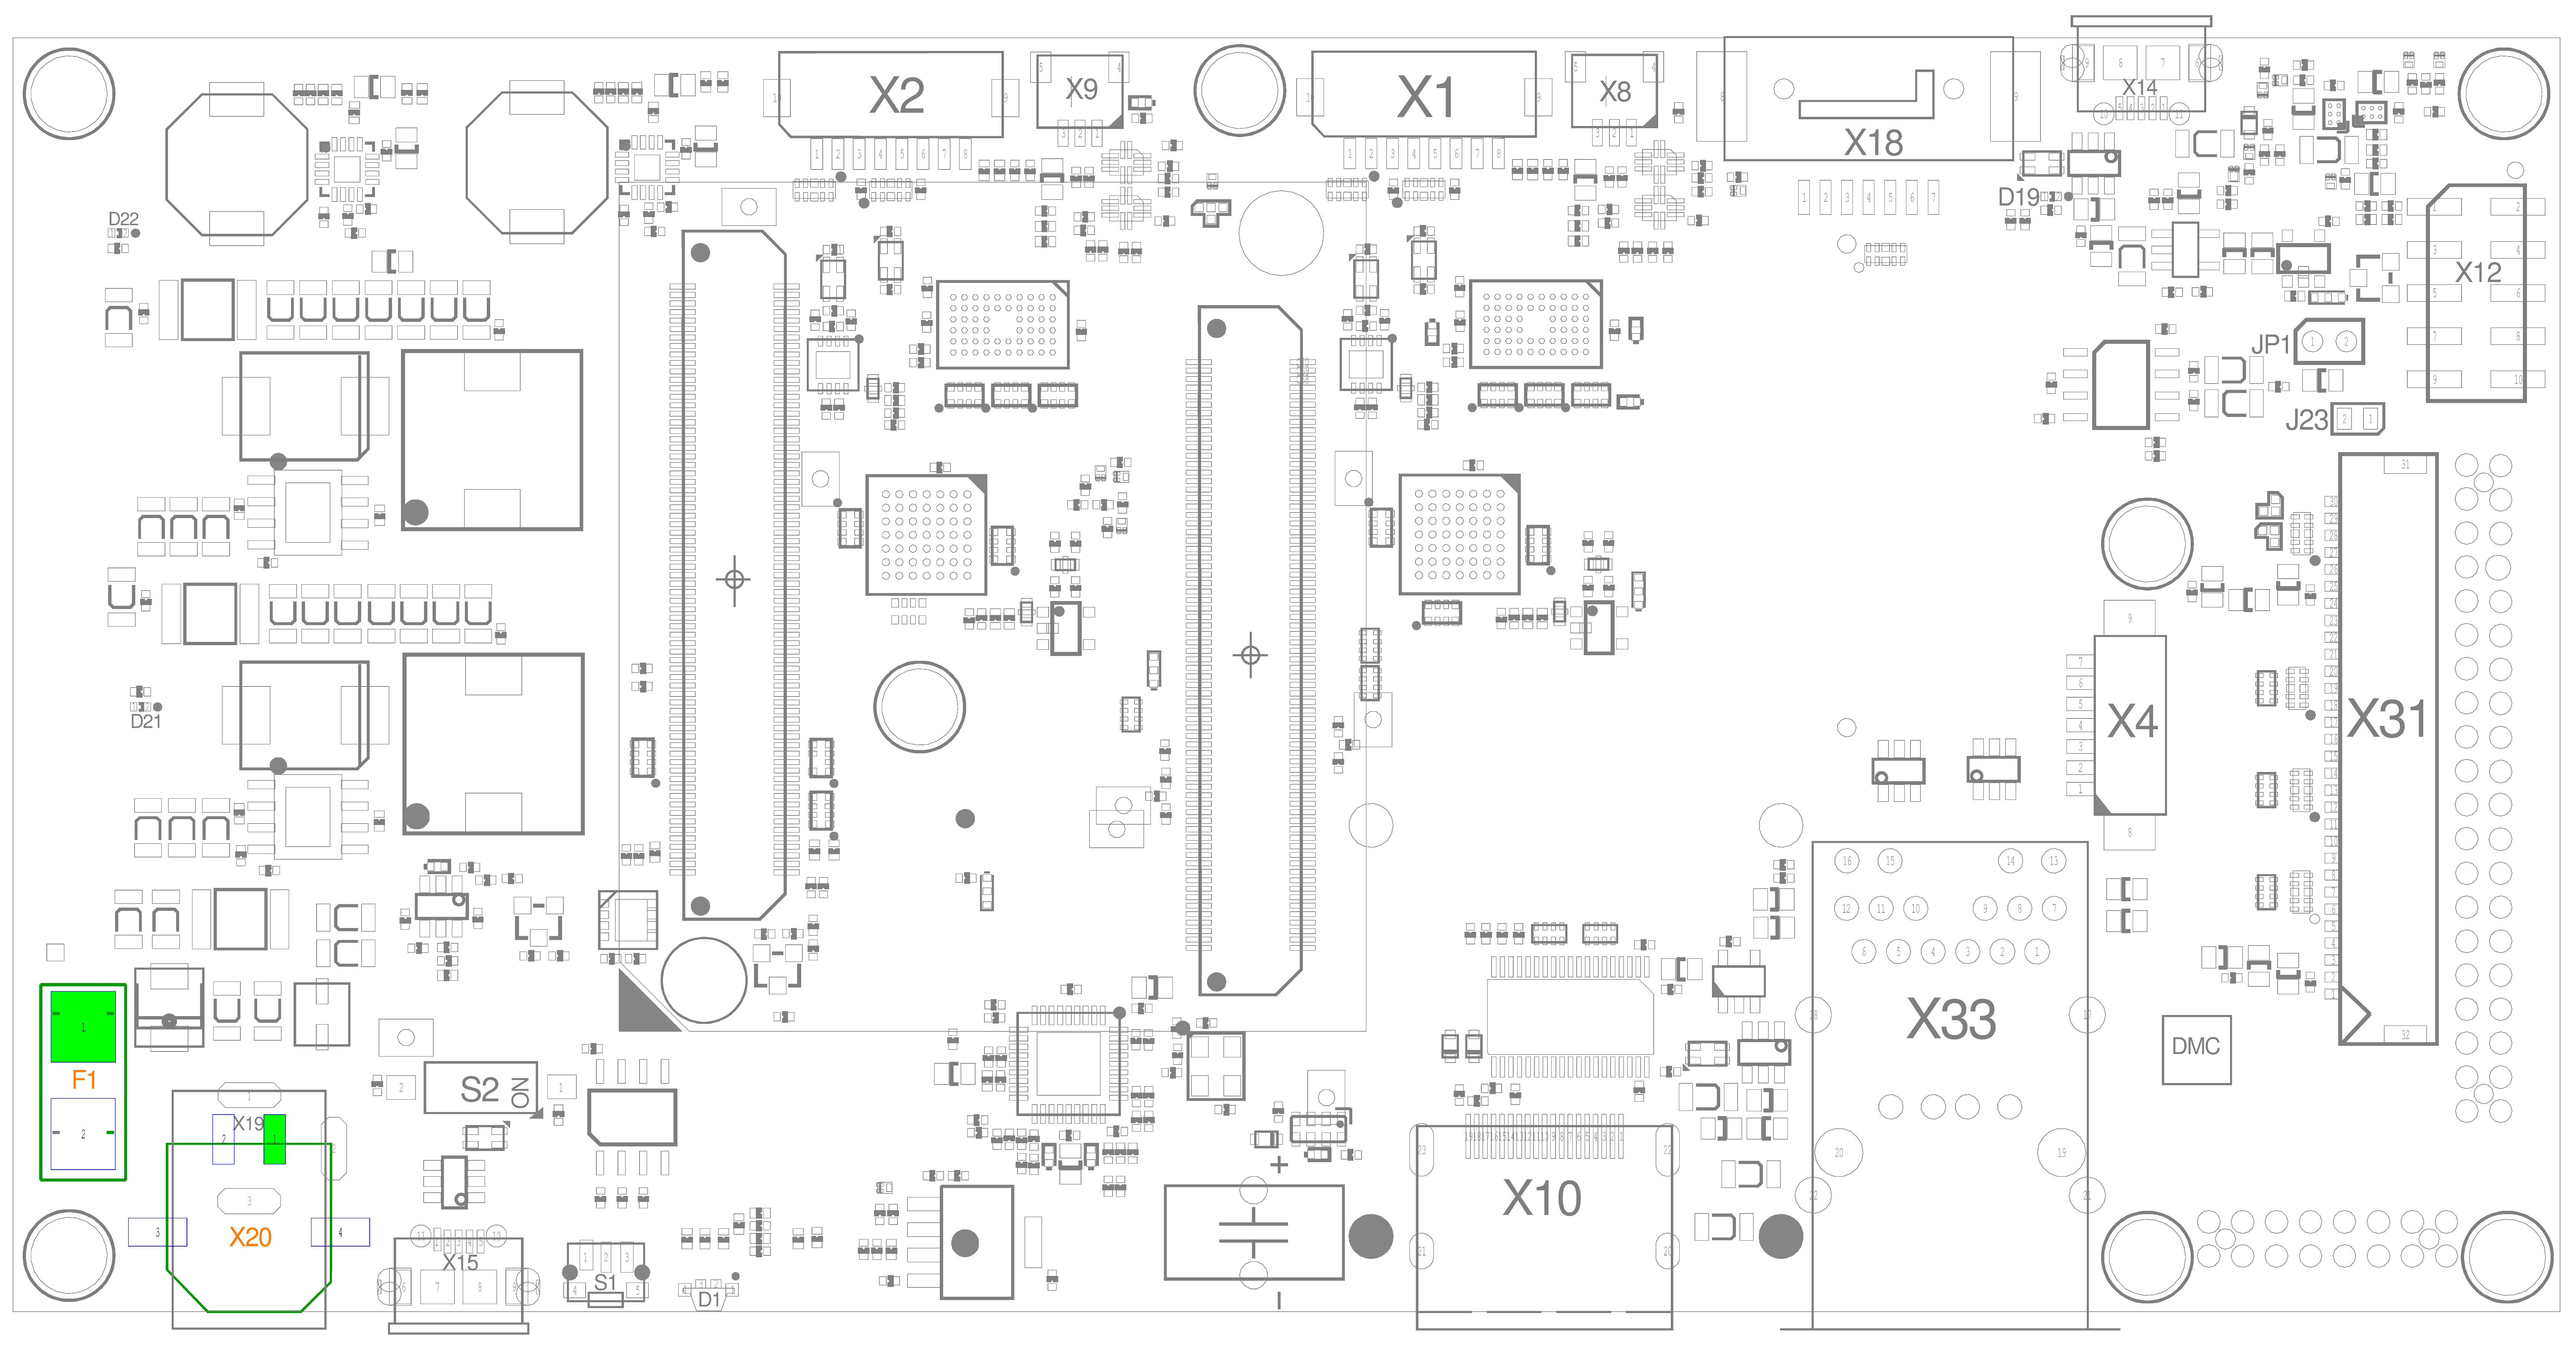 Molex Micro 3.0TM Connector (X20)